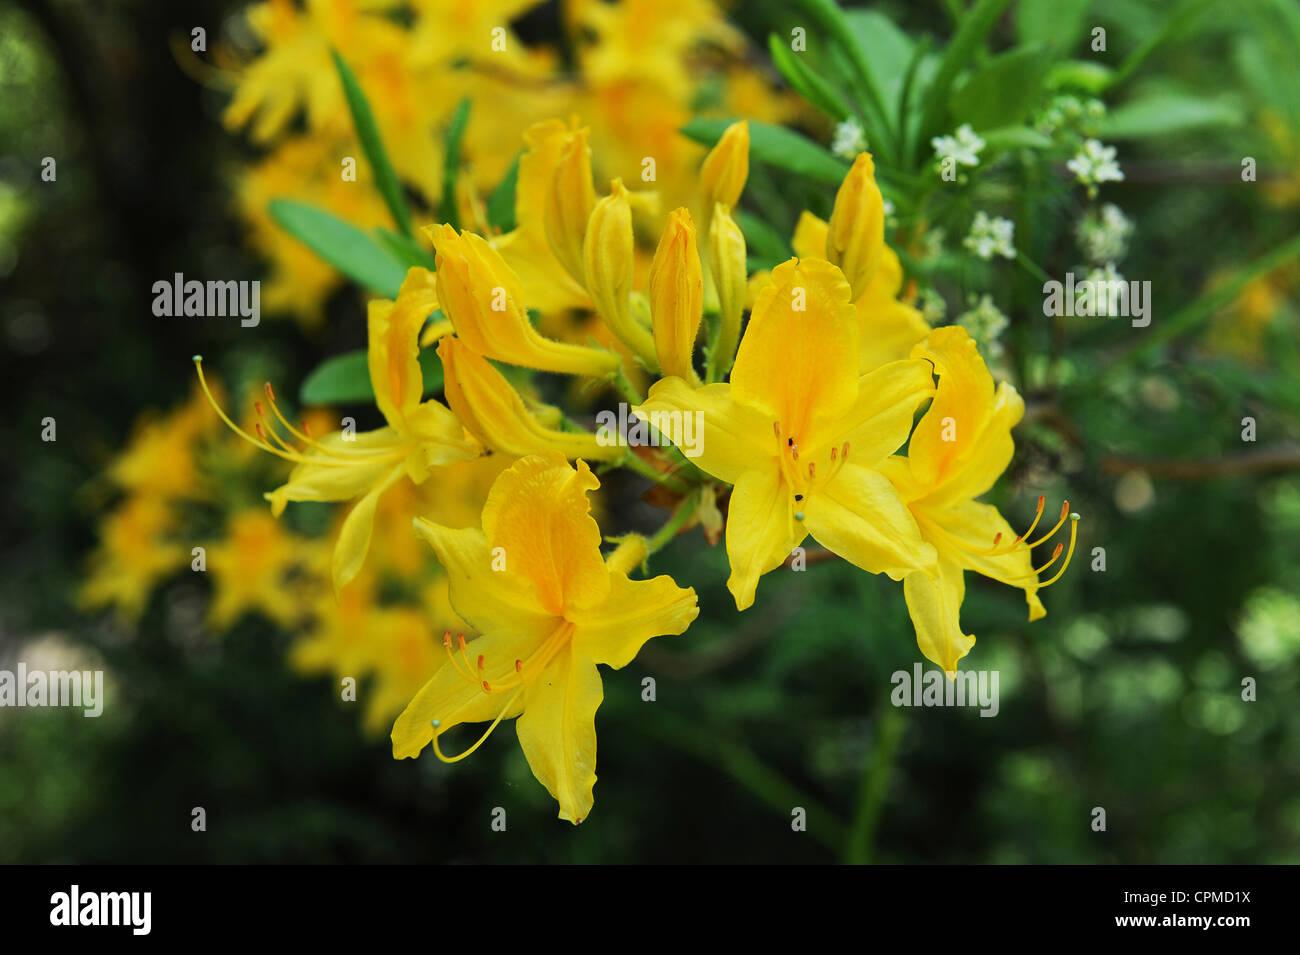 Yellow Azalea Rhododendron cultivar Uk - Stock Image